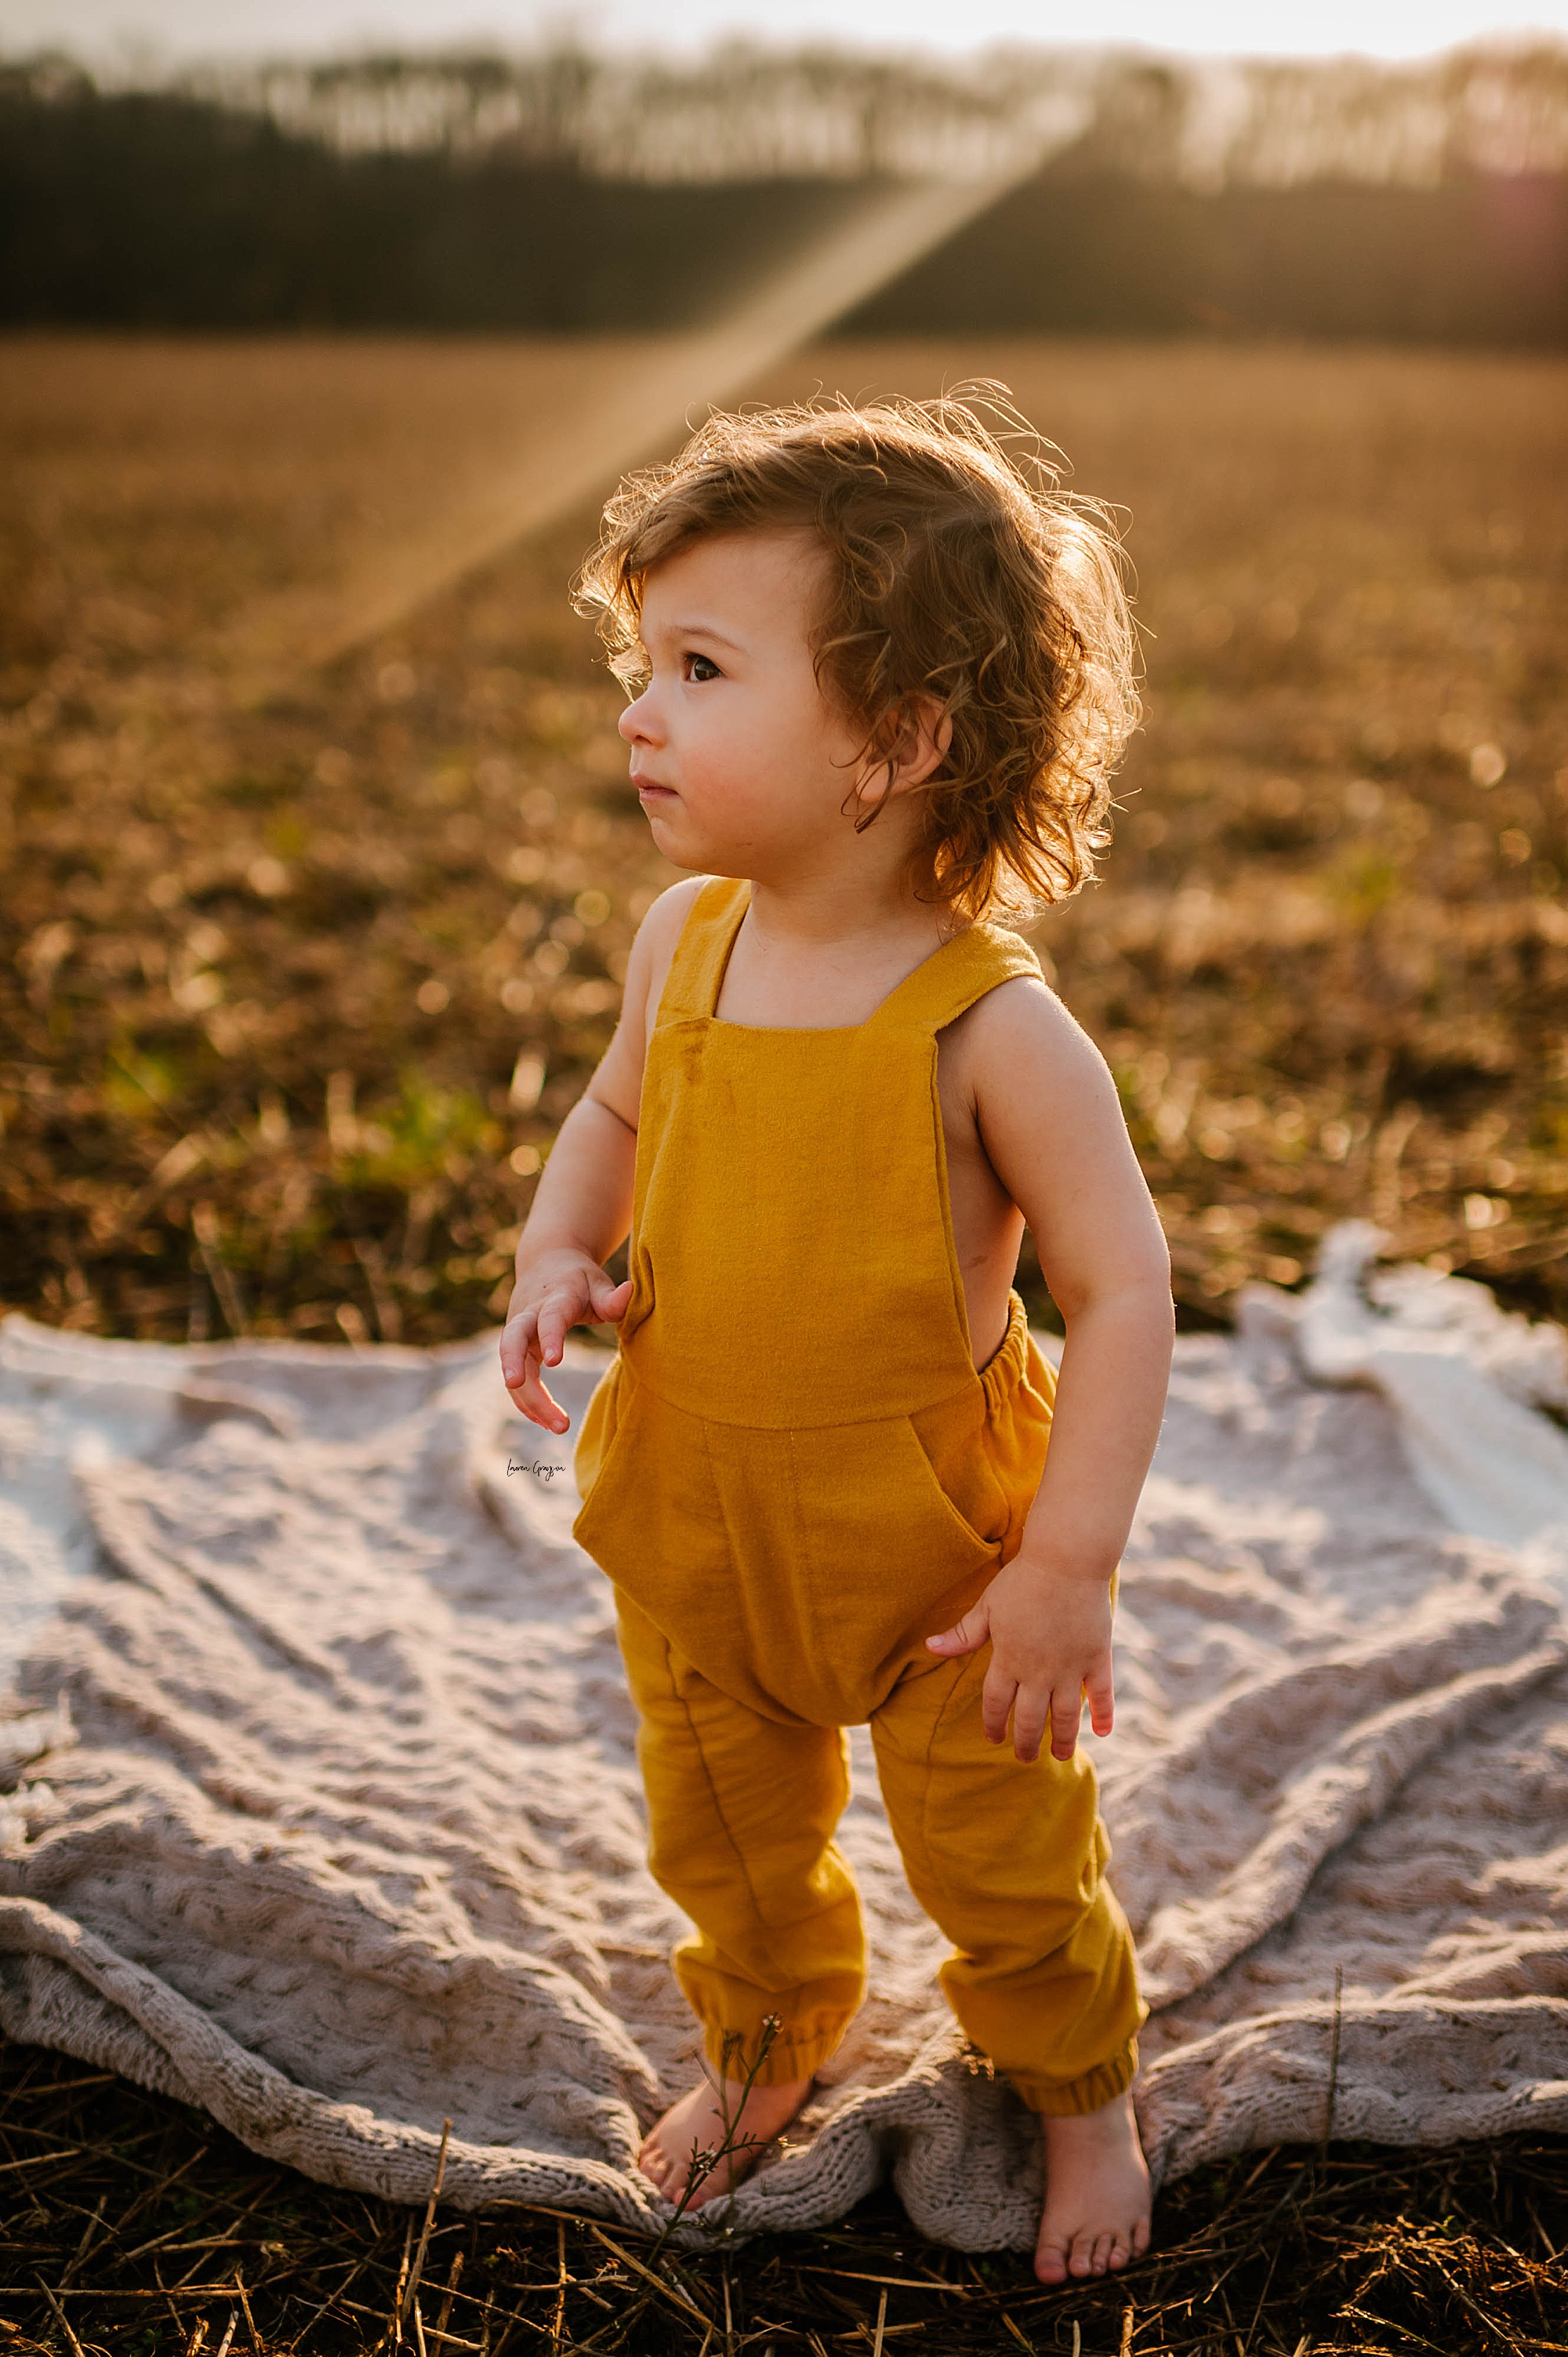 lauren-grayson-photography-akron-ohio-family-mom-boys-field-spring-outdoor-session_0034.jpg